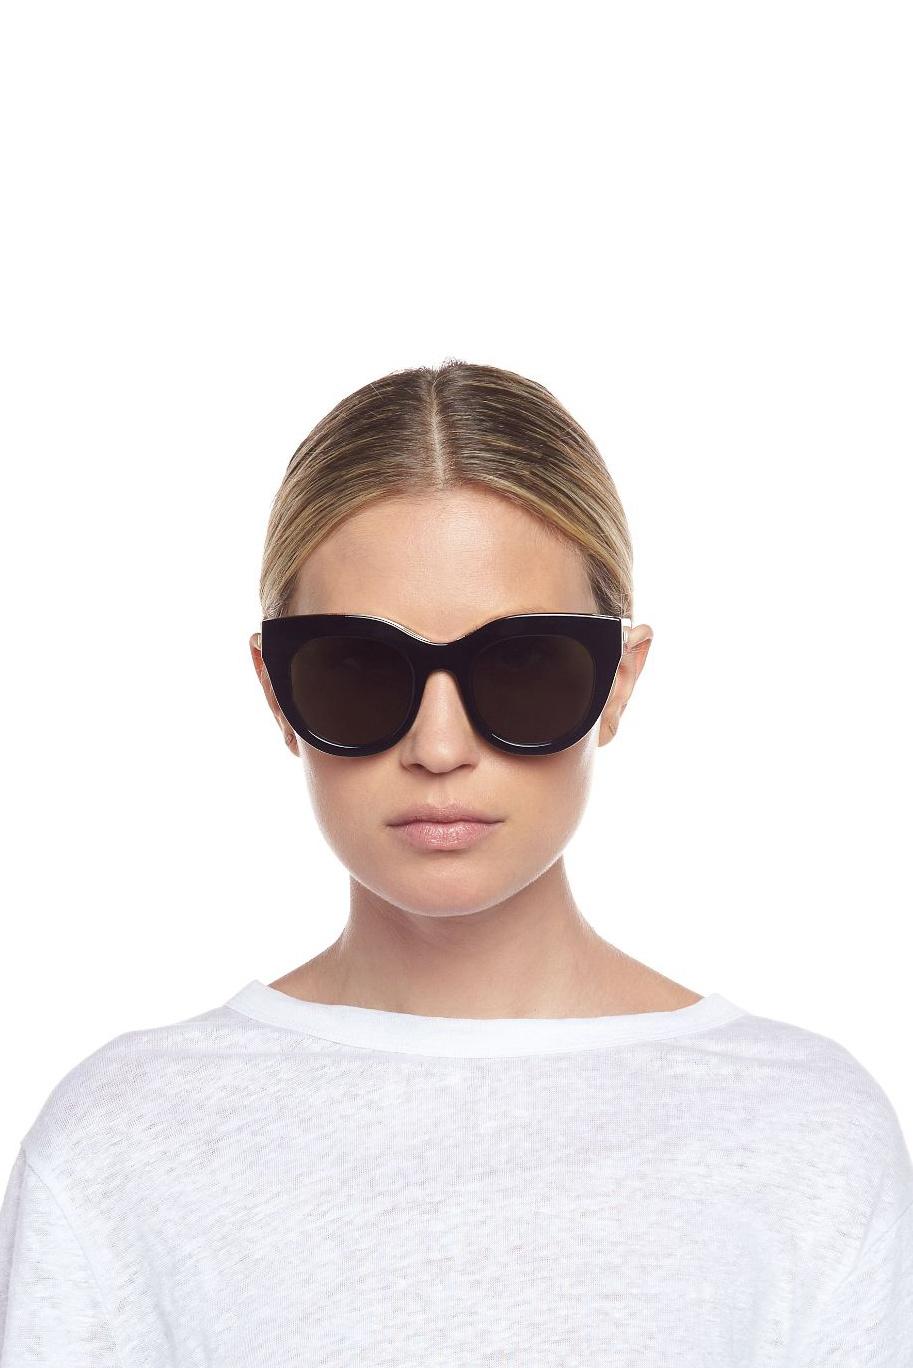 Air Heart Sunglasses - Black-2